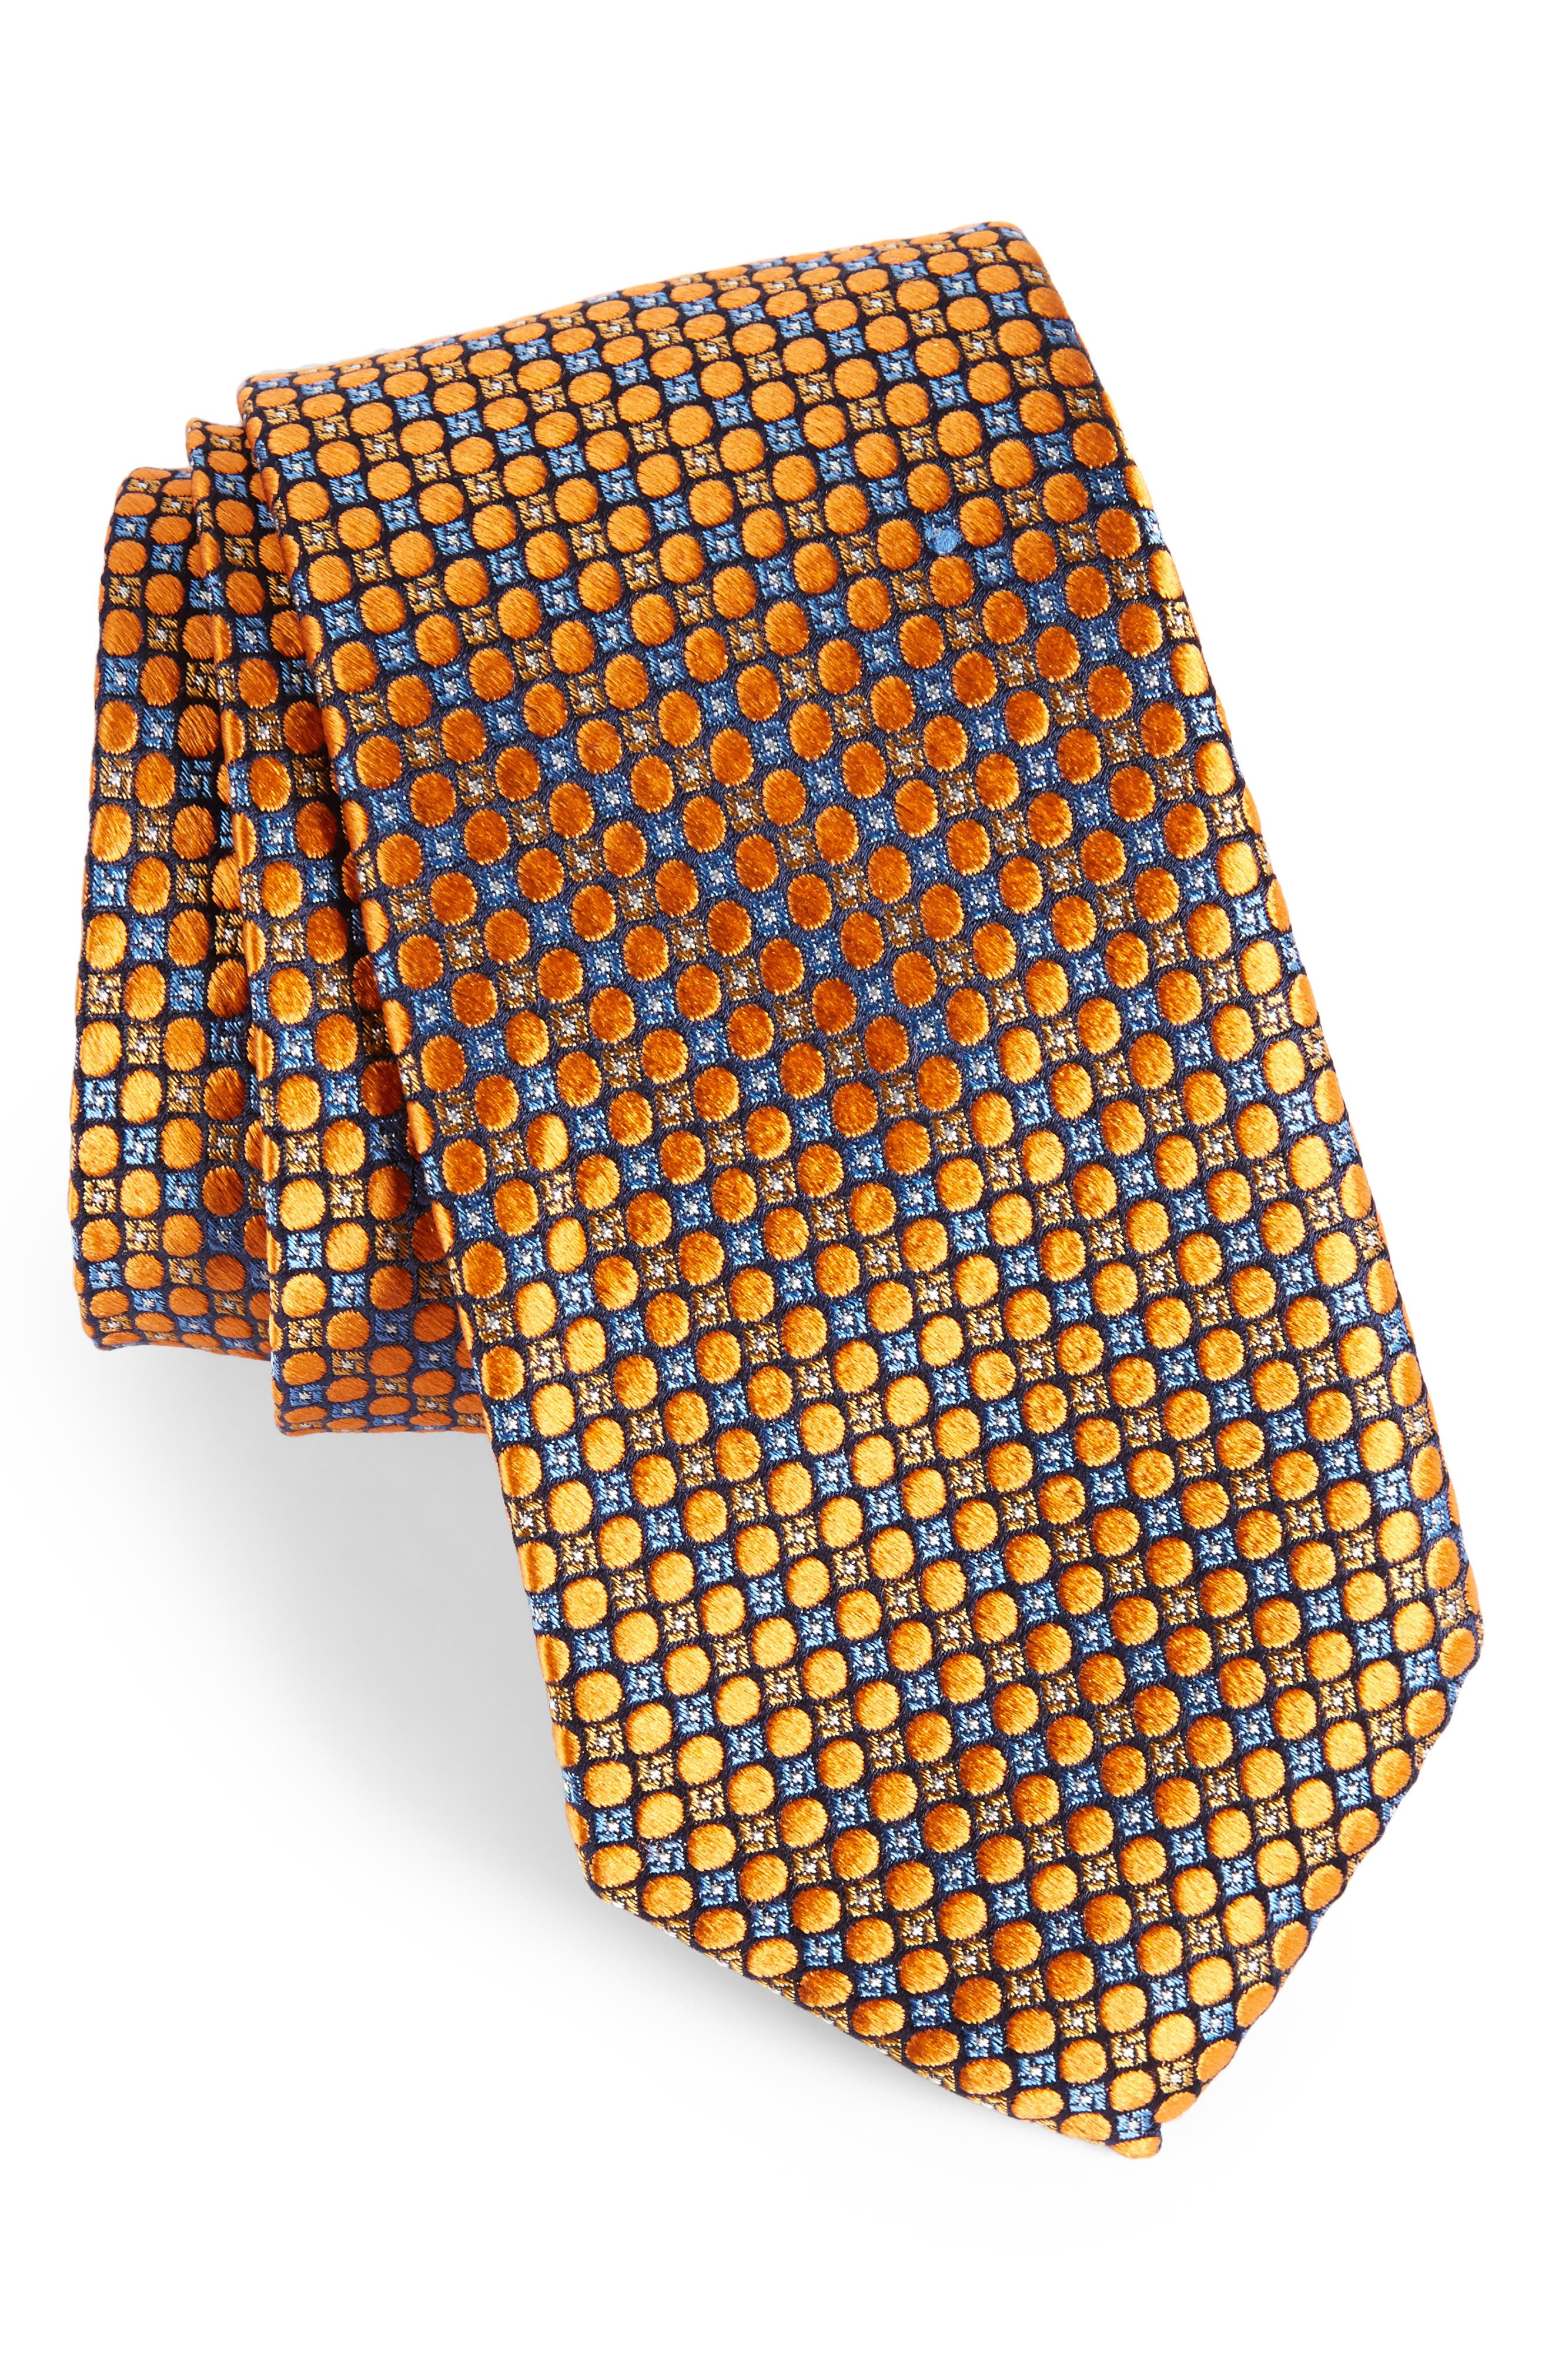 Alternate Image 1 Selected - Nordstrom Men's Shop Carter Dot Silk Tie